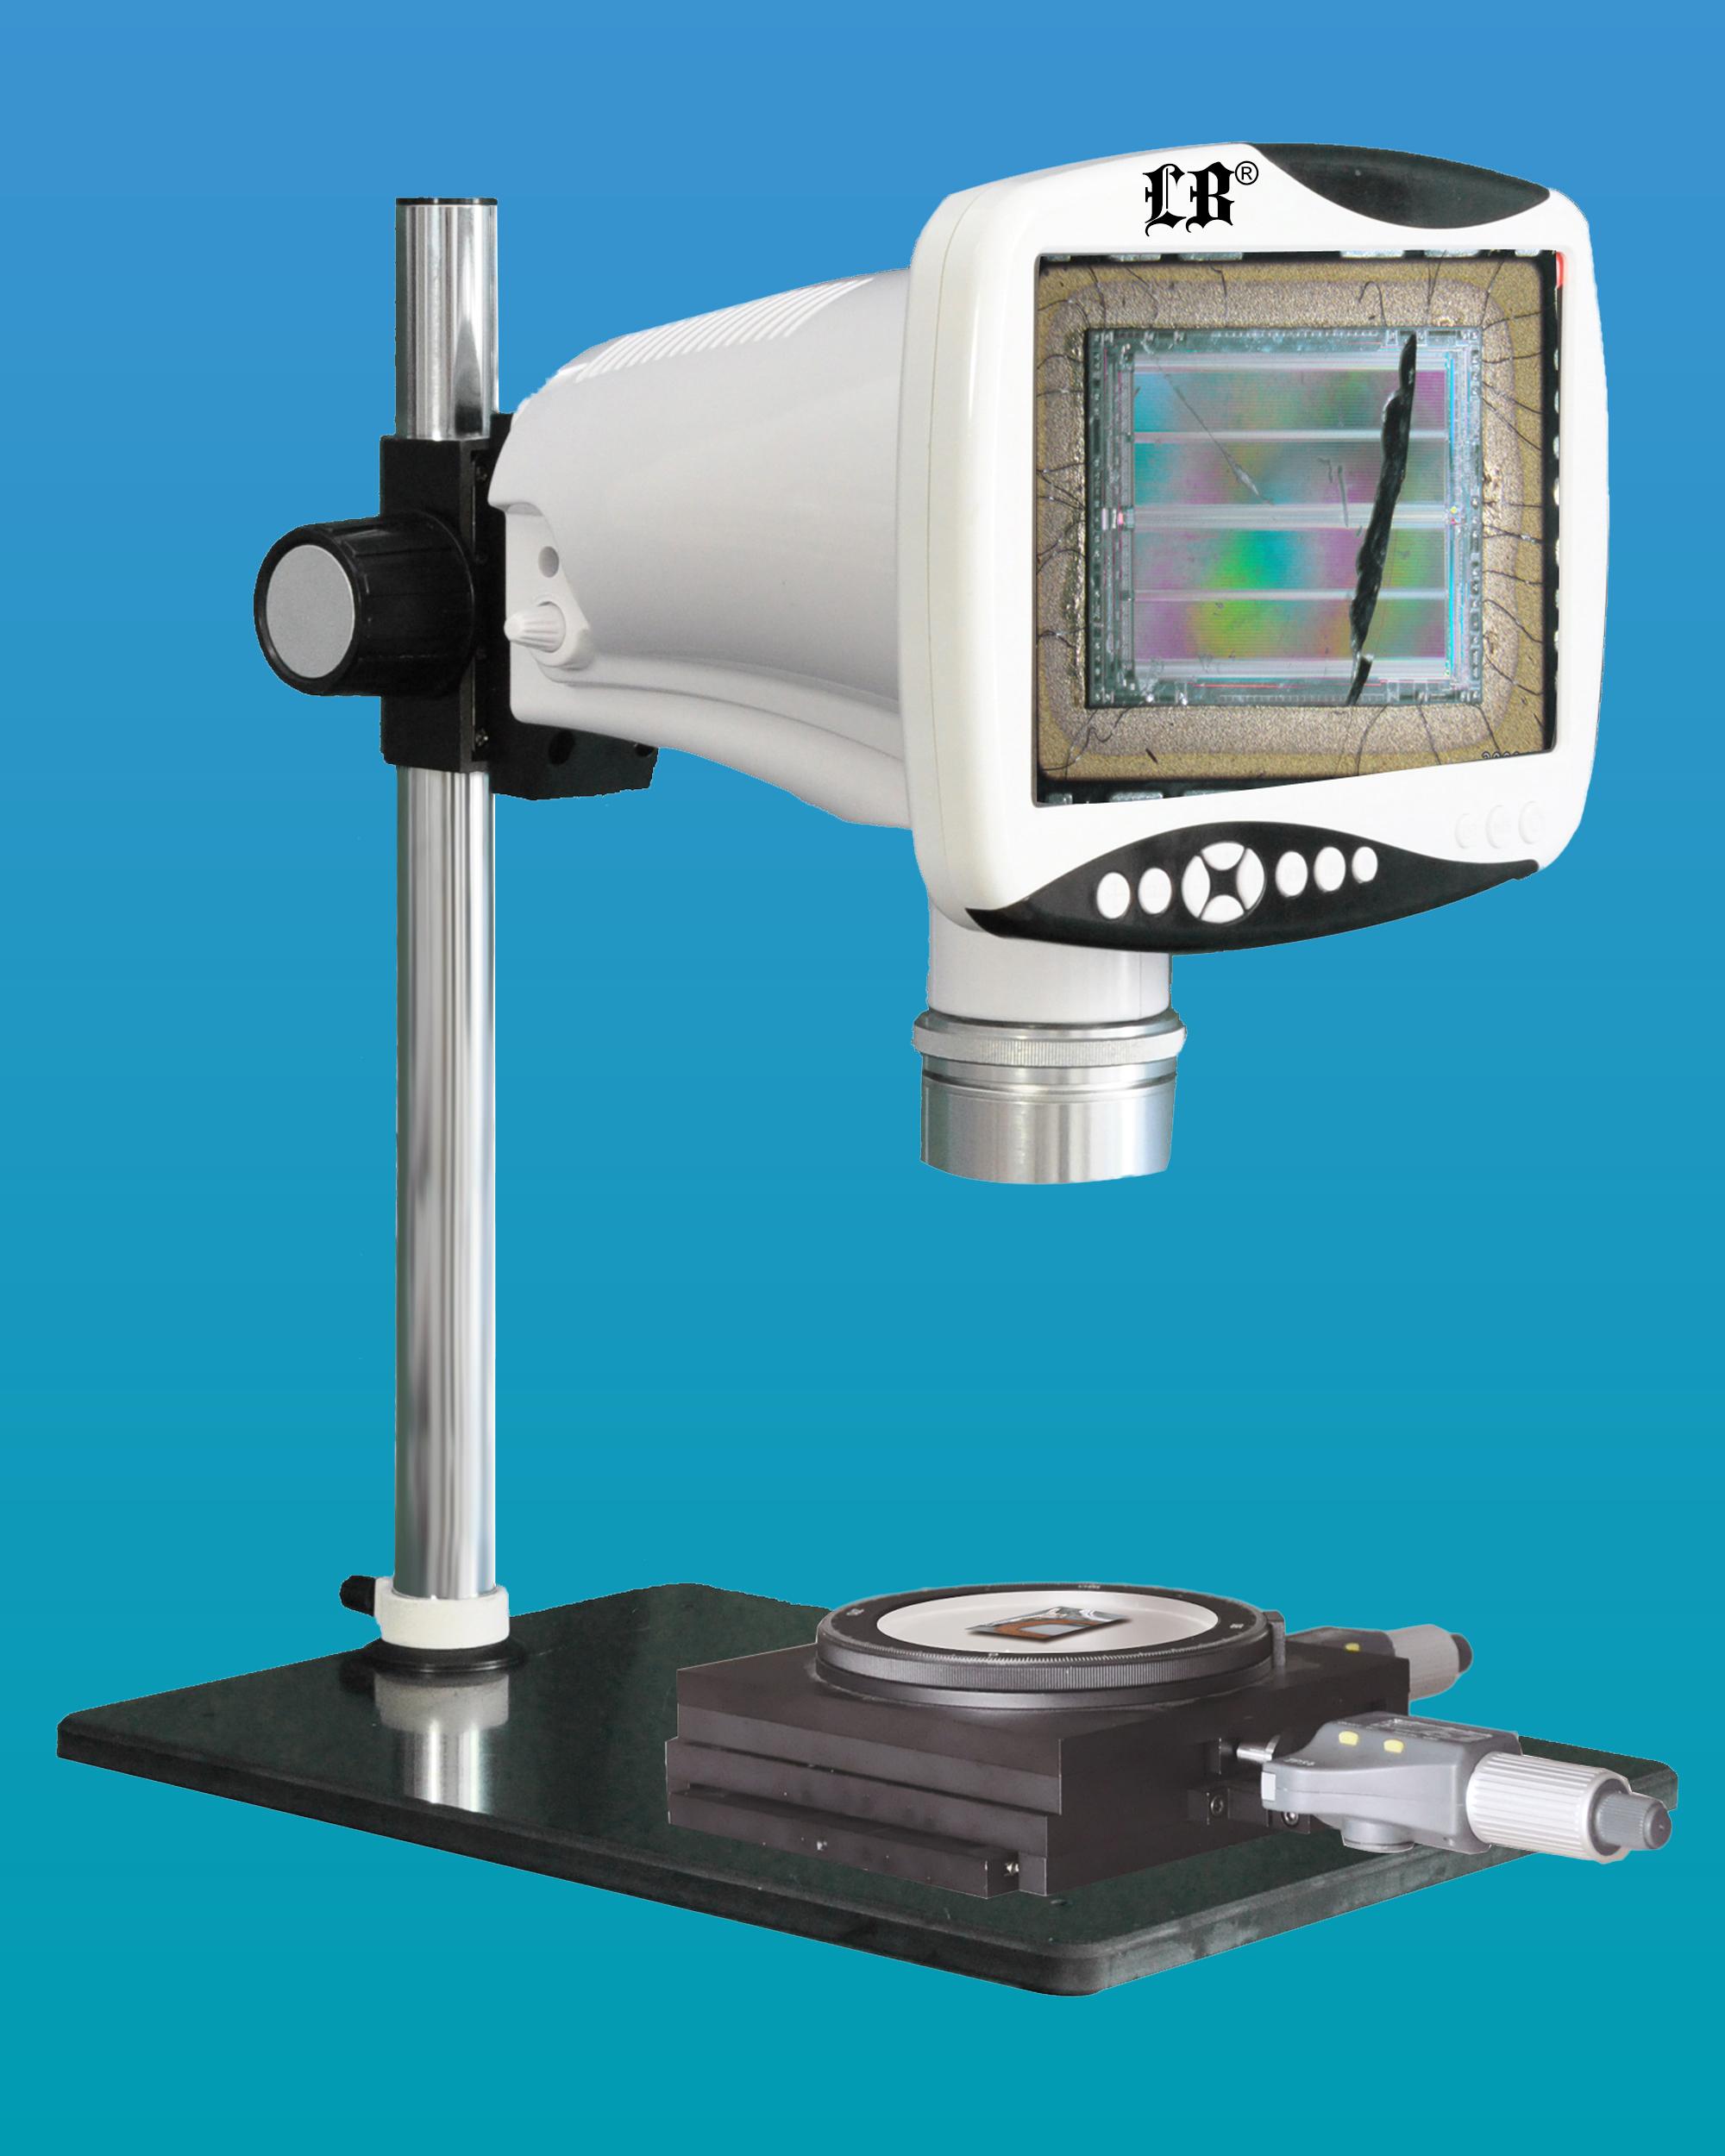 "[LB-343] Digital LCD Stereo Measuring Microscope w/ 9"" HD LCD Screen w/ HD Video & HDMI Output"